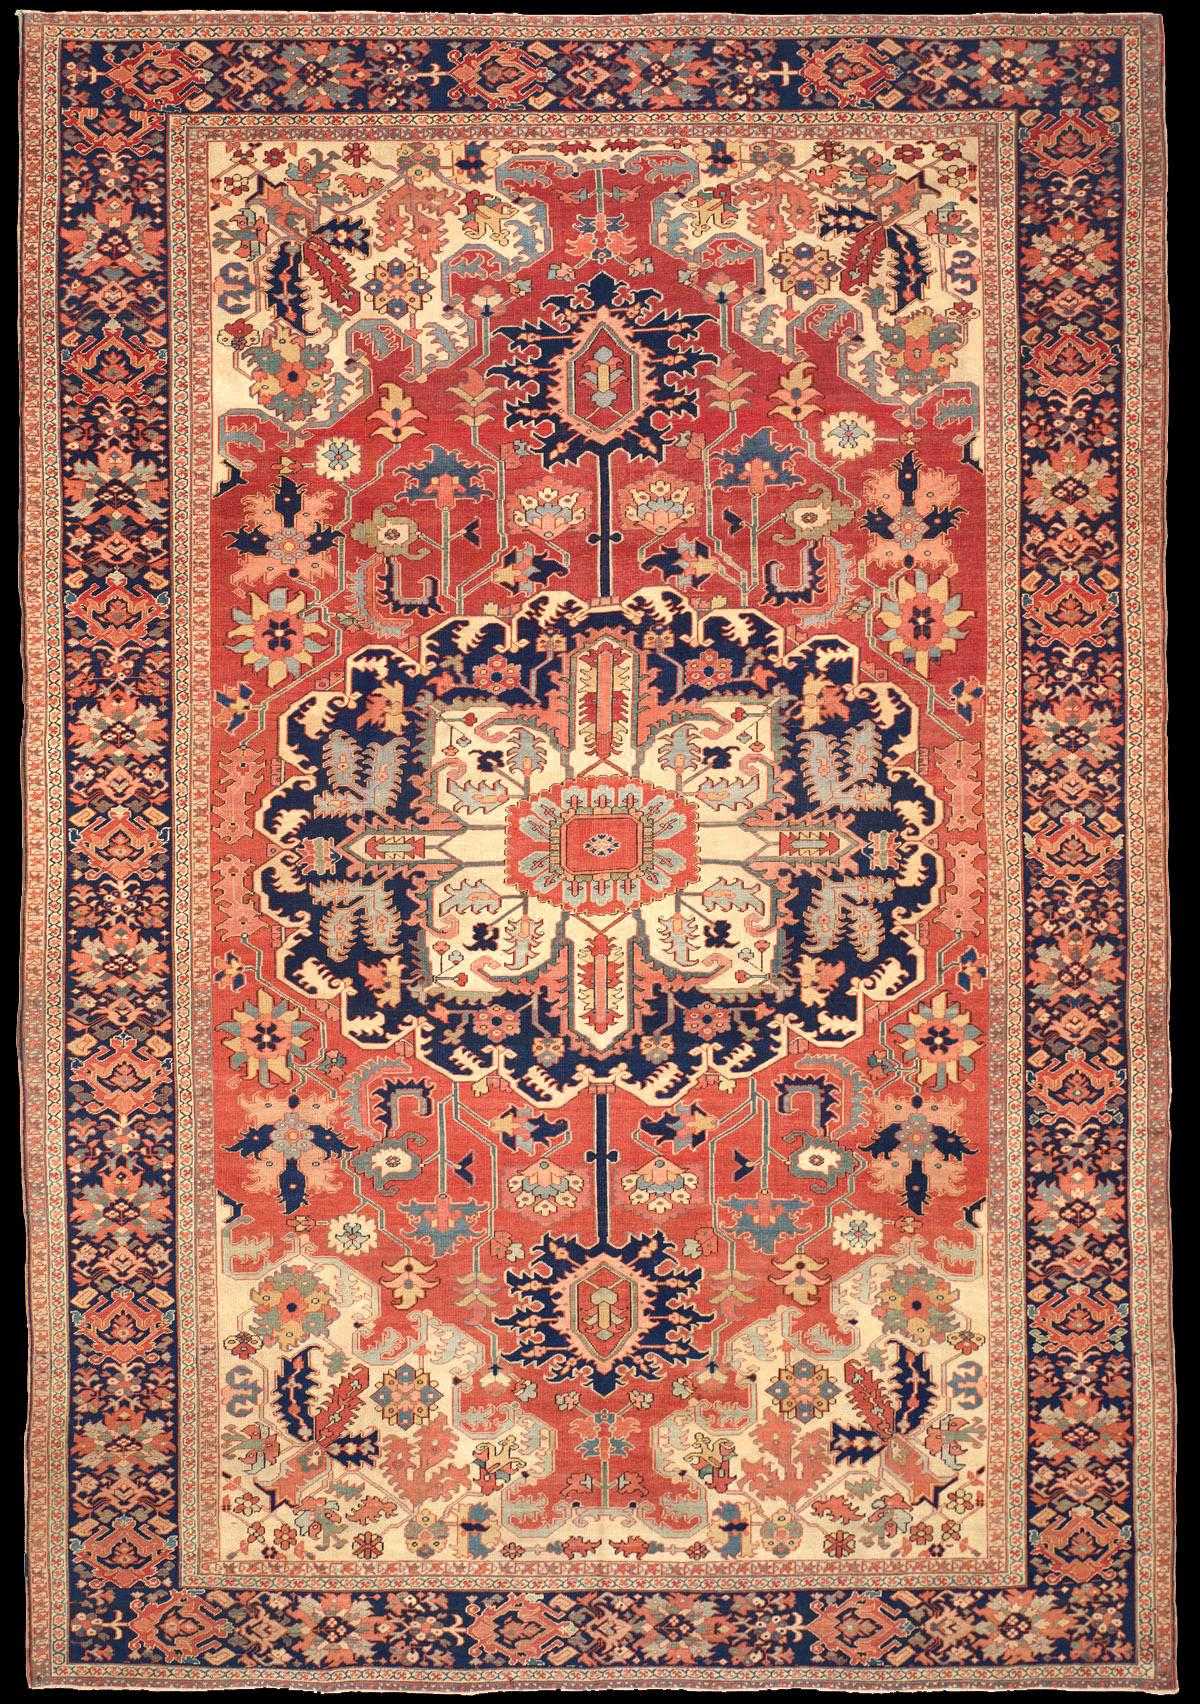 Antique Serapi Rug Azerbaijan Nw Iran 9 39 8 X 14 39 7